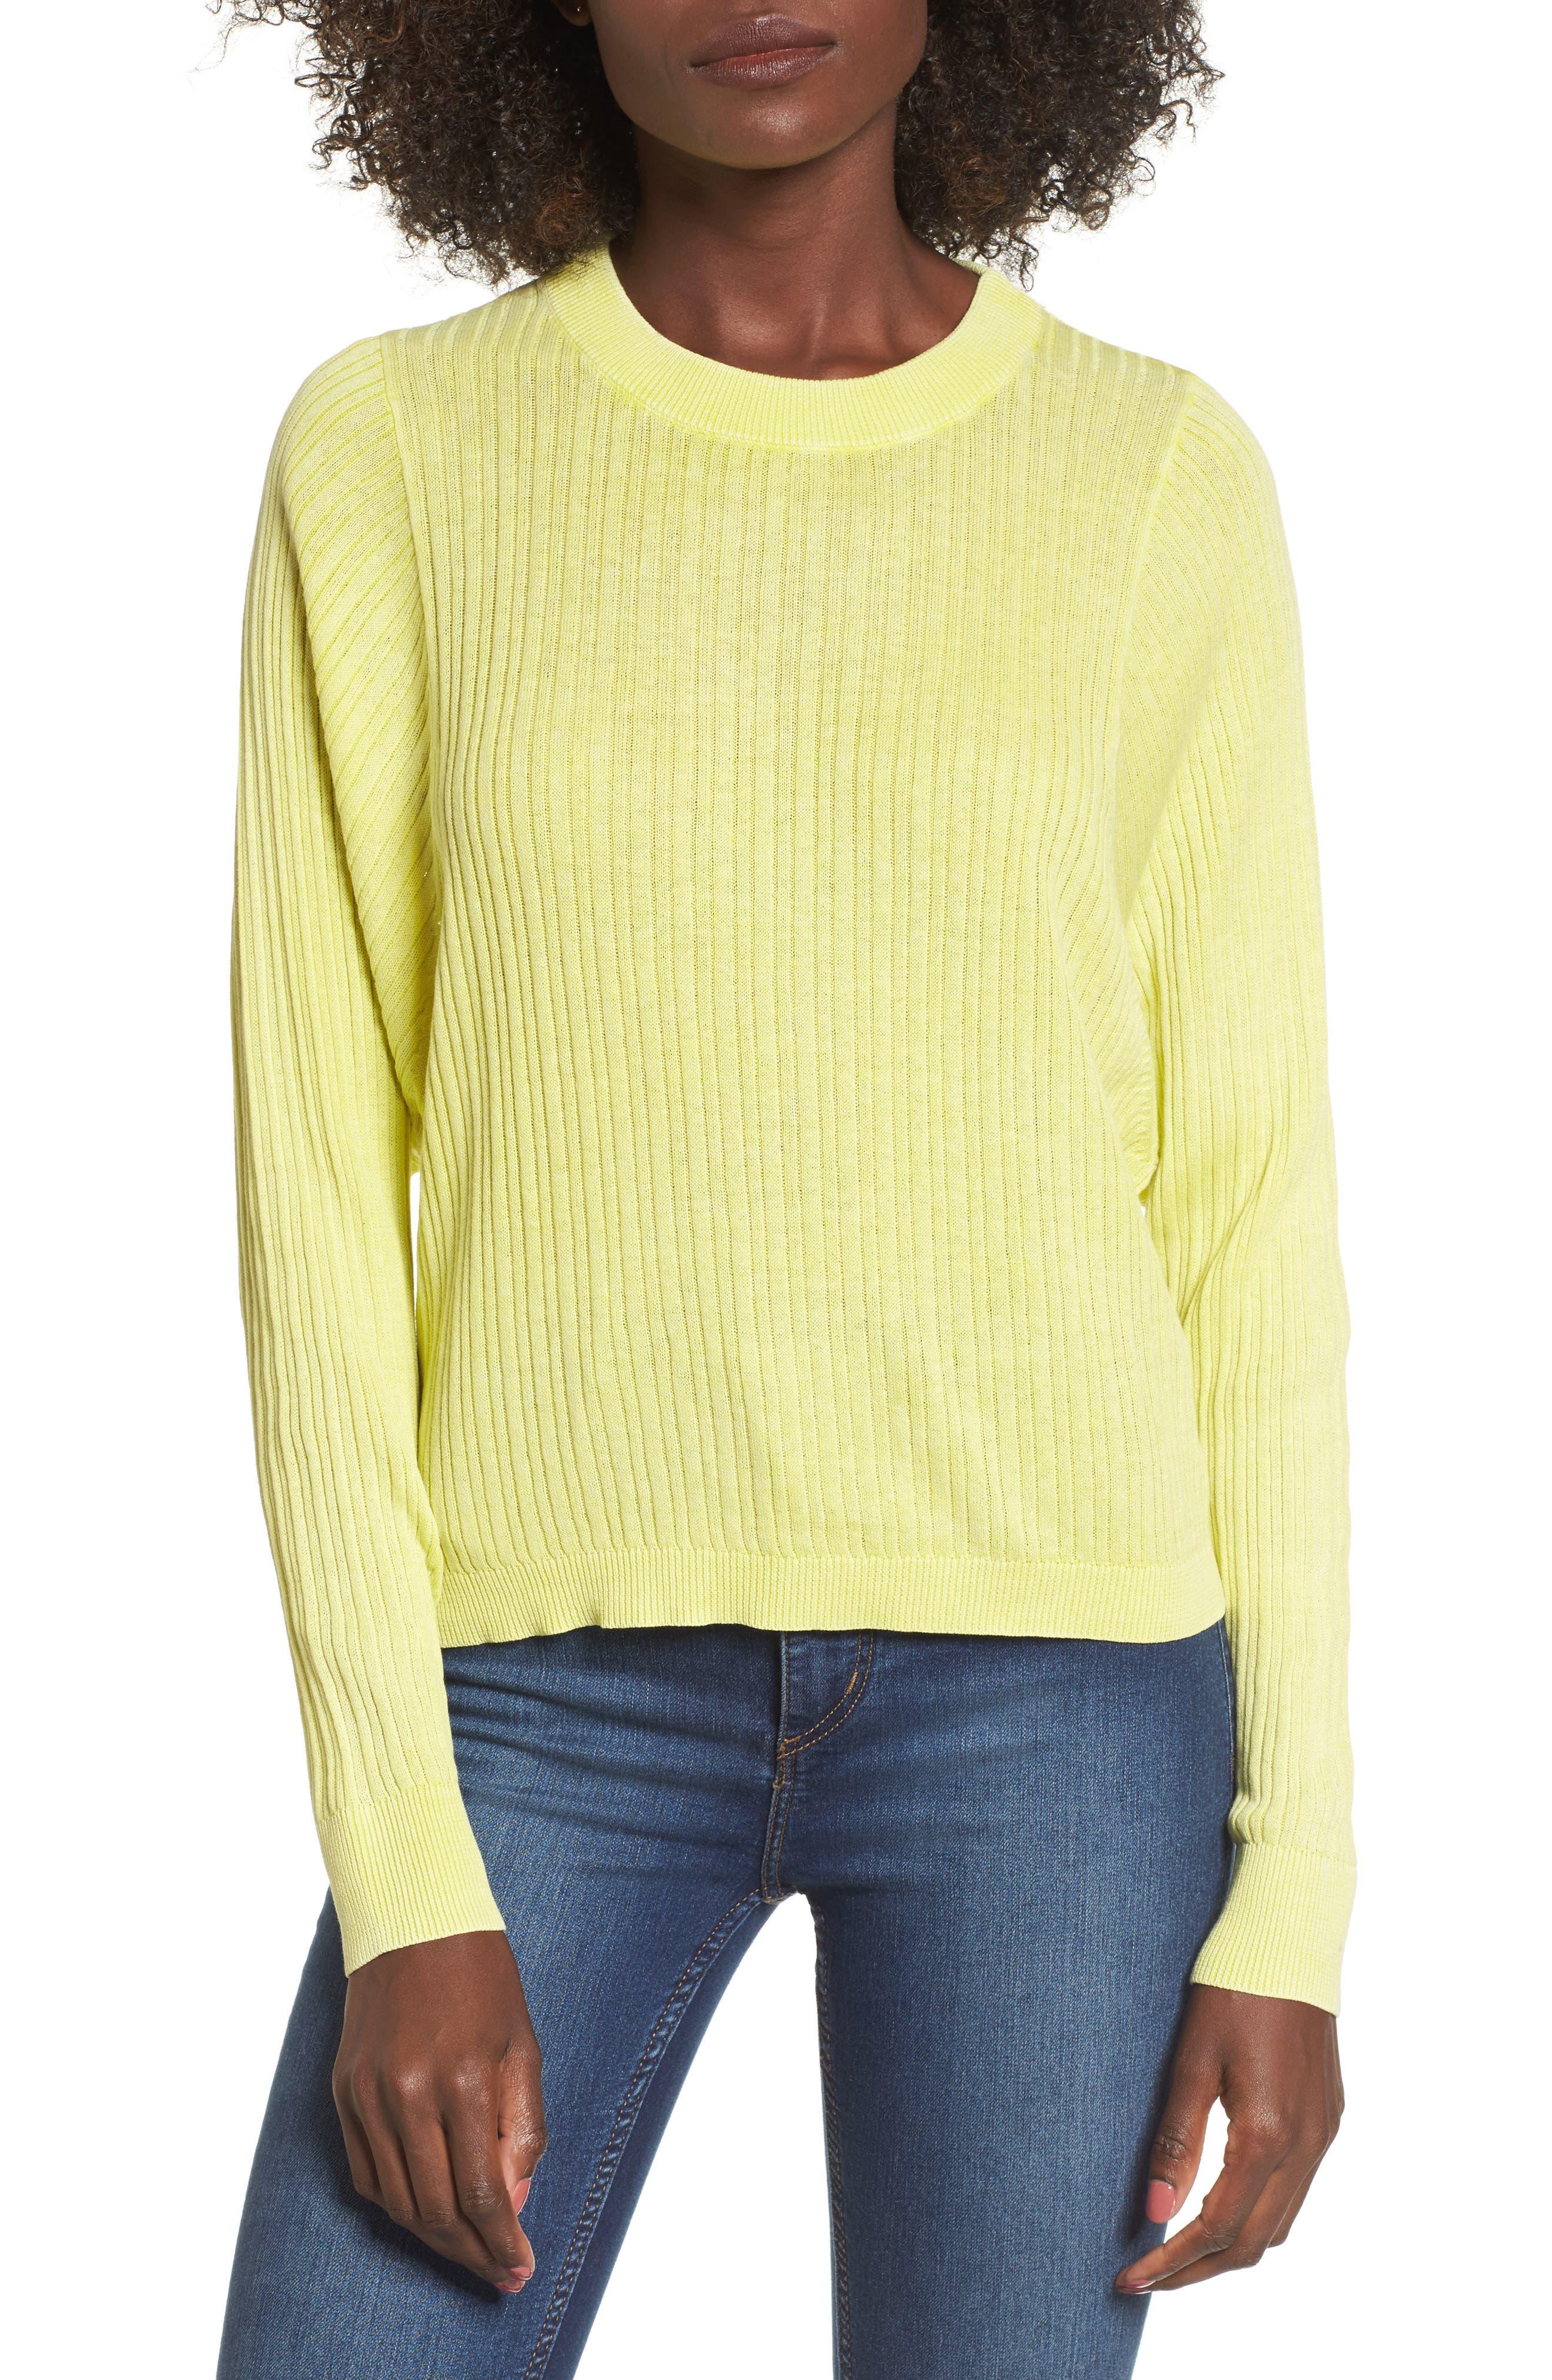 Alternate Image 1 Selected - BP. Crewneck Variegated Rib-Knit Sweater